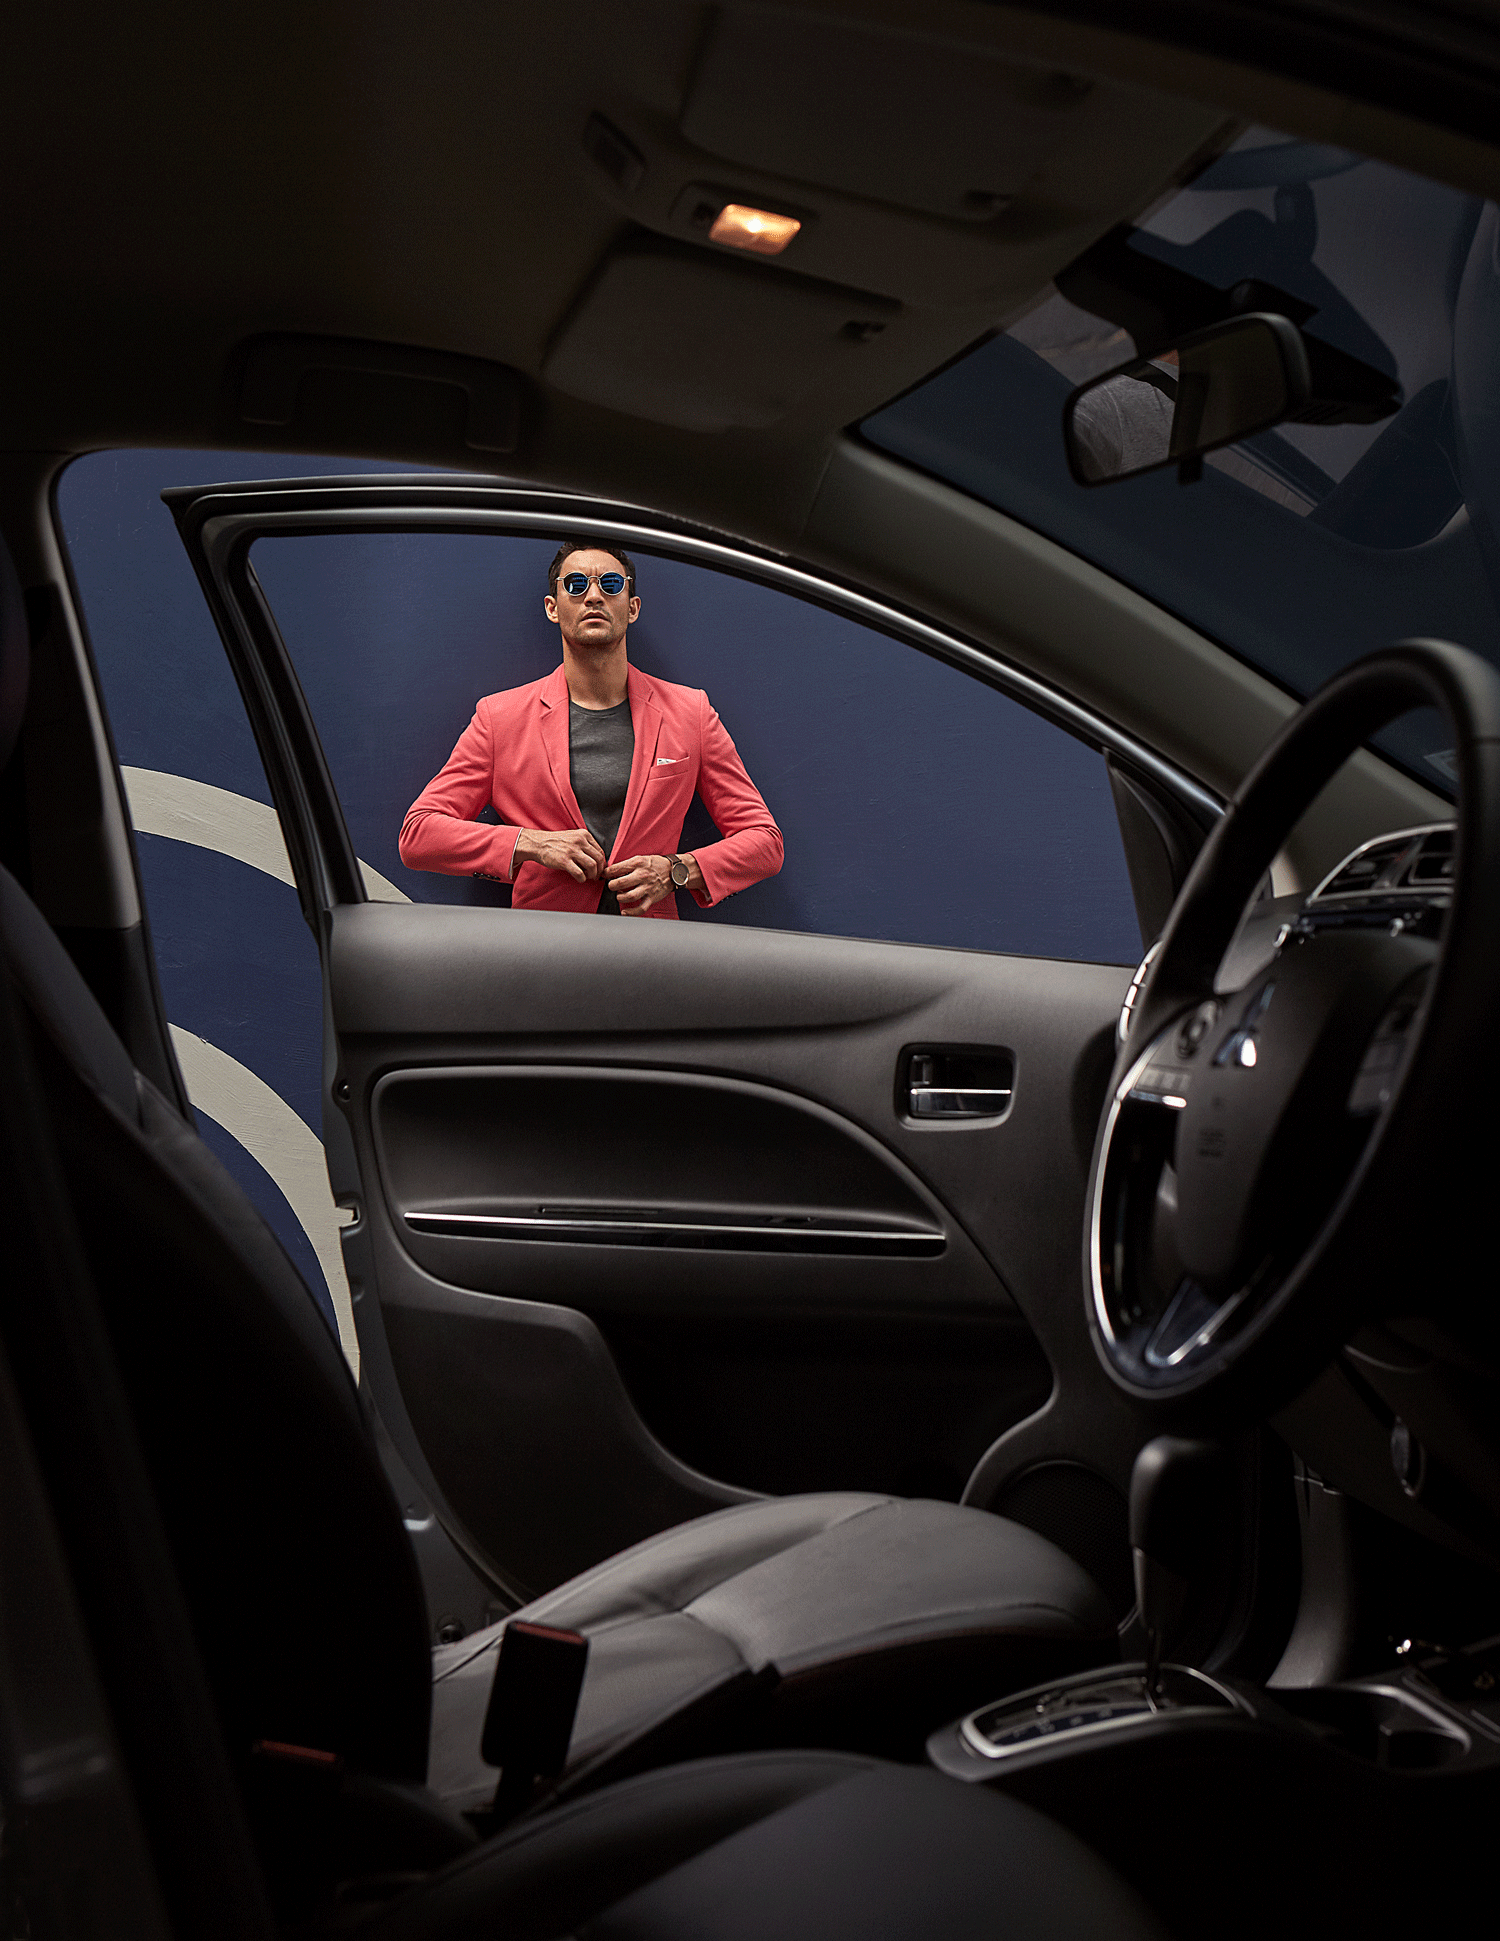 car : Mitsubishi NEW Attrage  clothes : SARIT / sunglasses : TAVAT / watch : FORREST